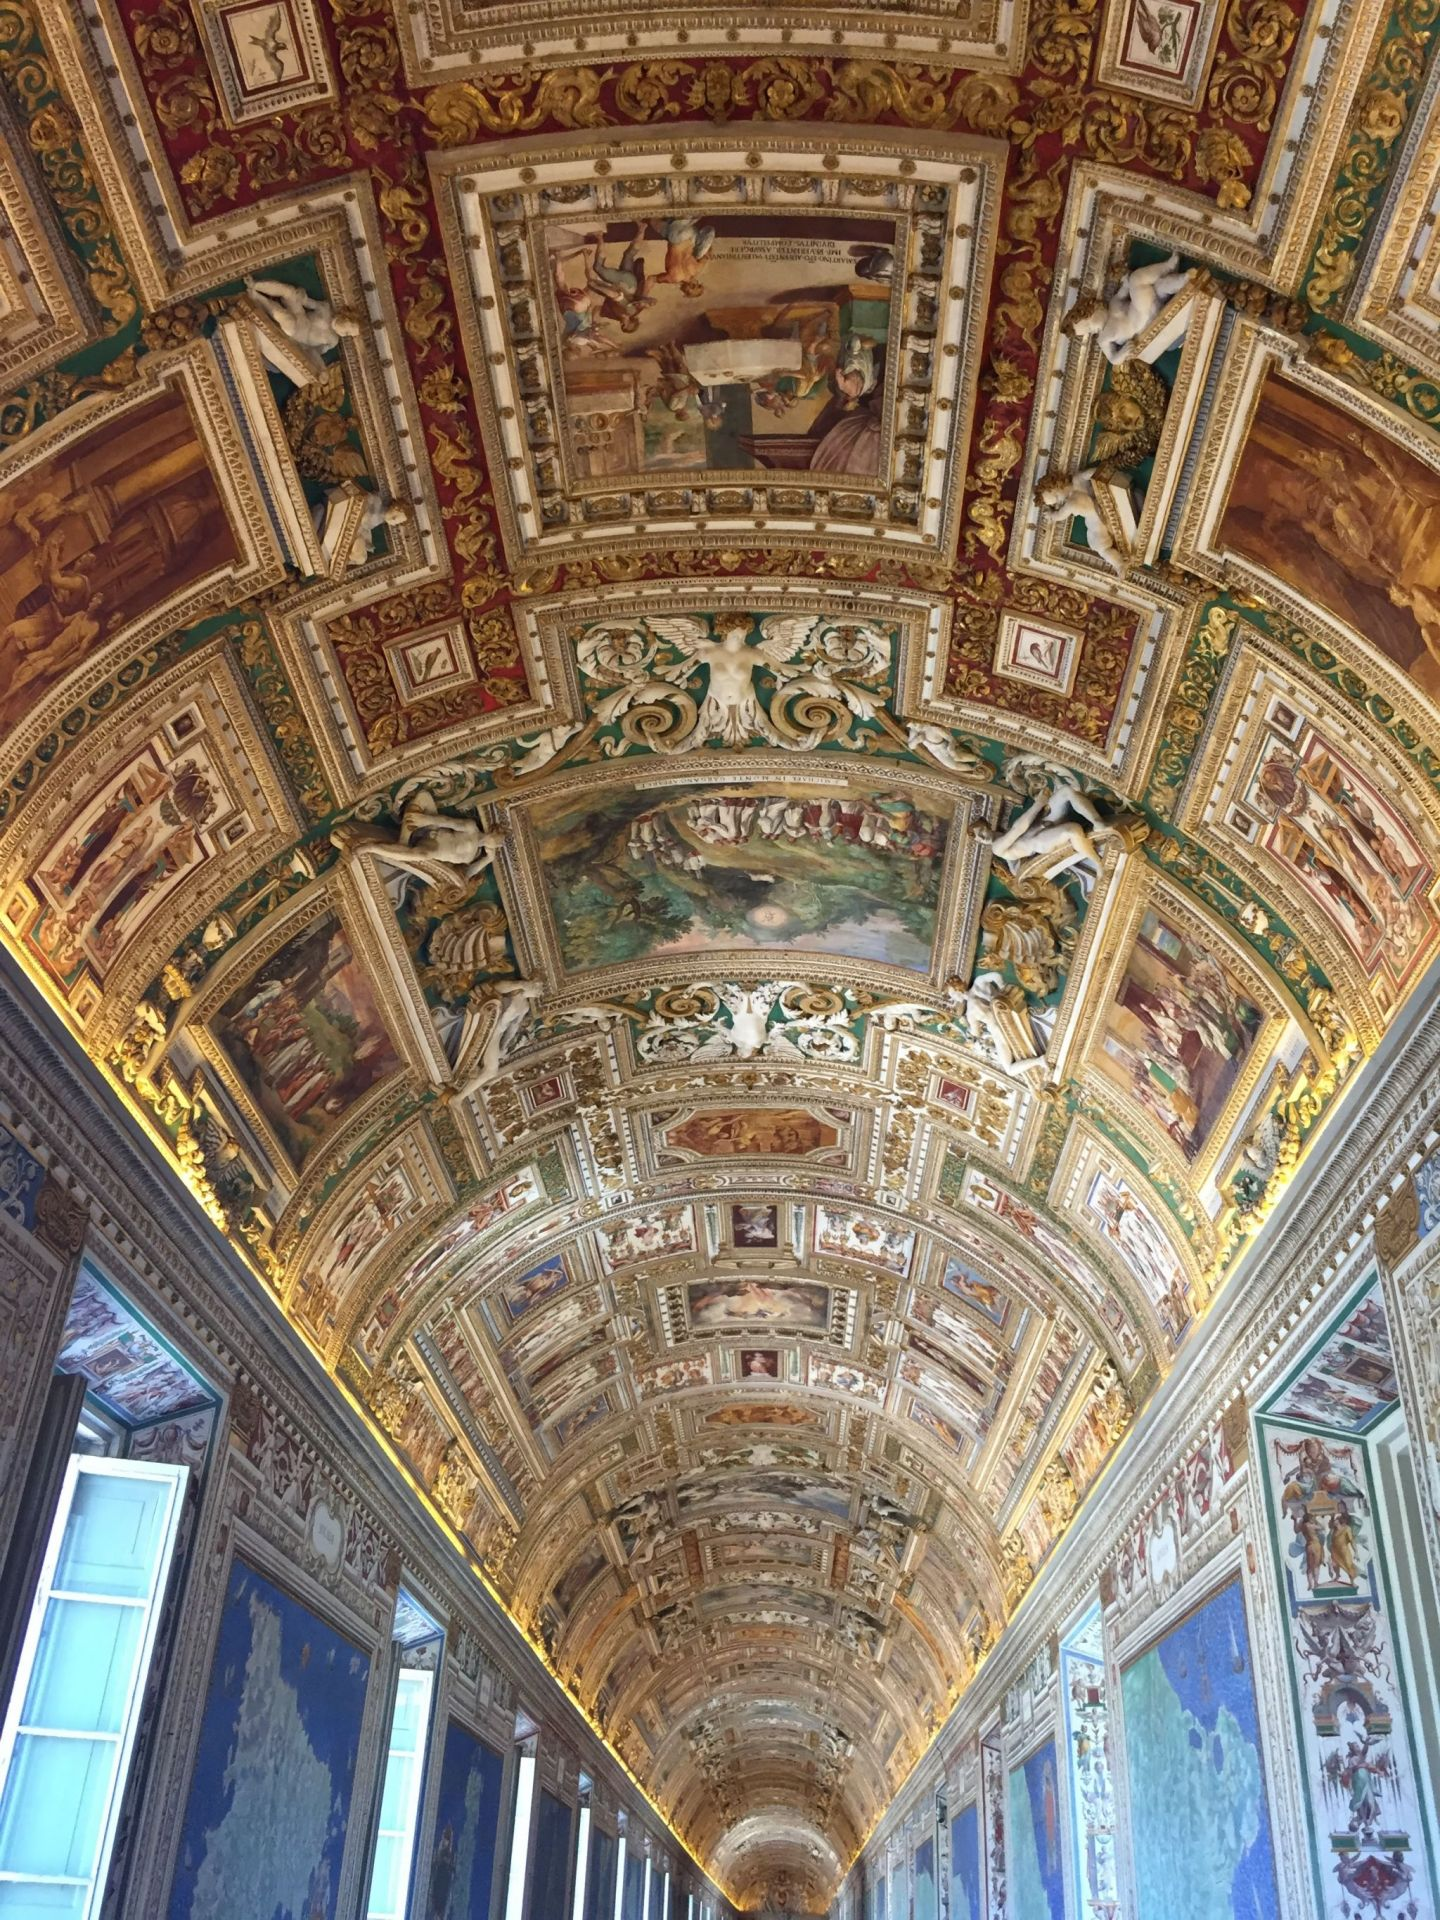 Elaborate ceiling artwork in the Vatican City Museum